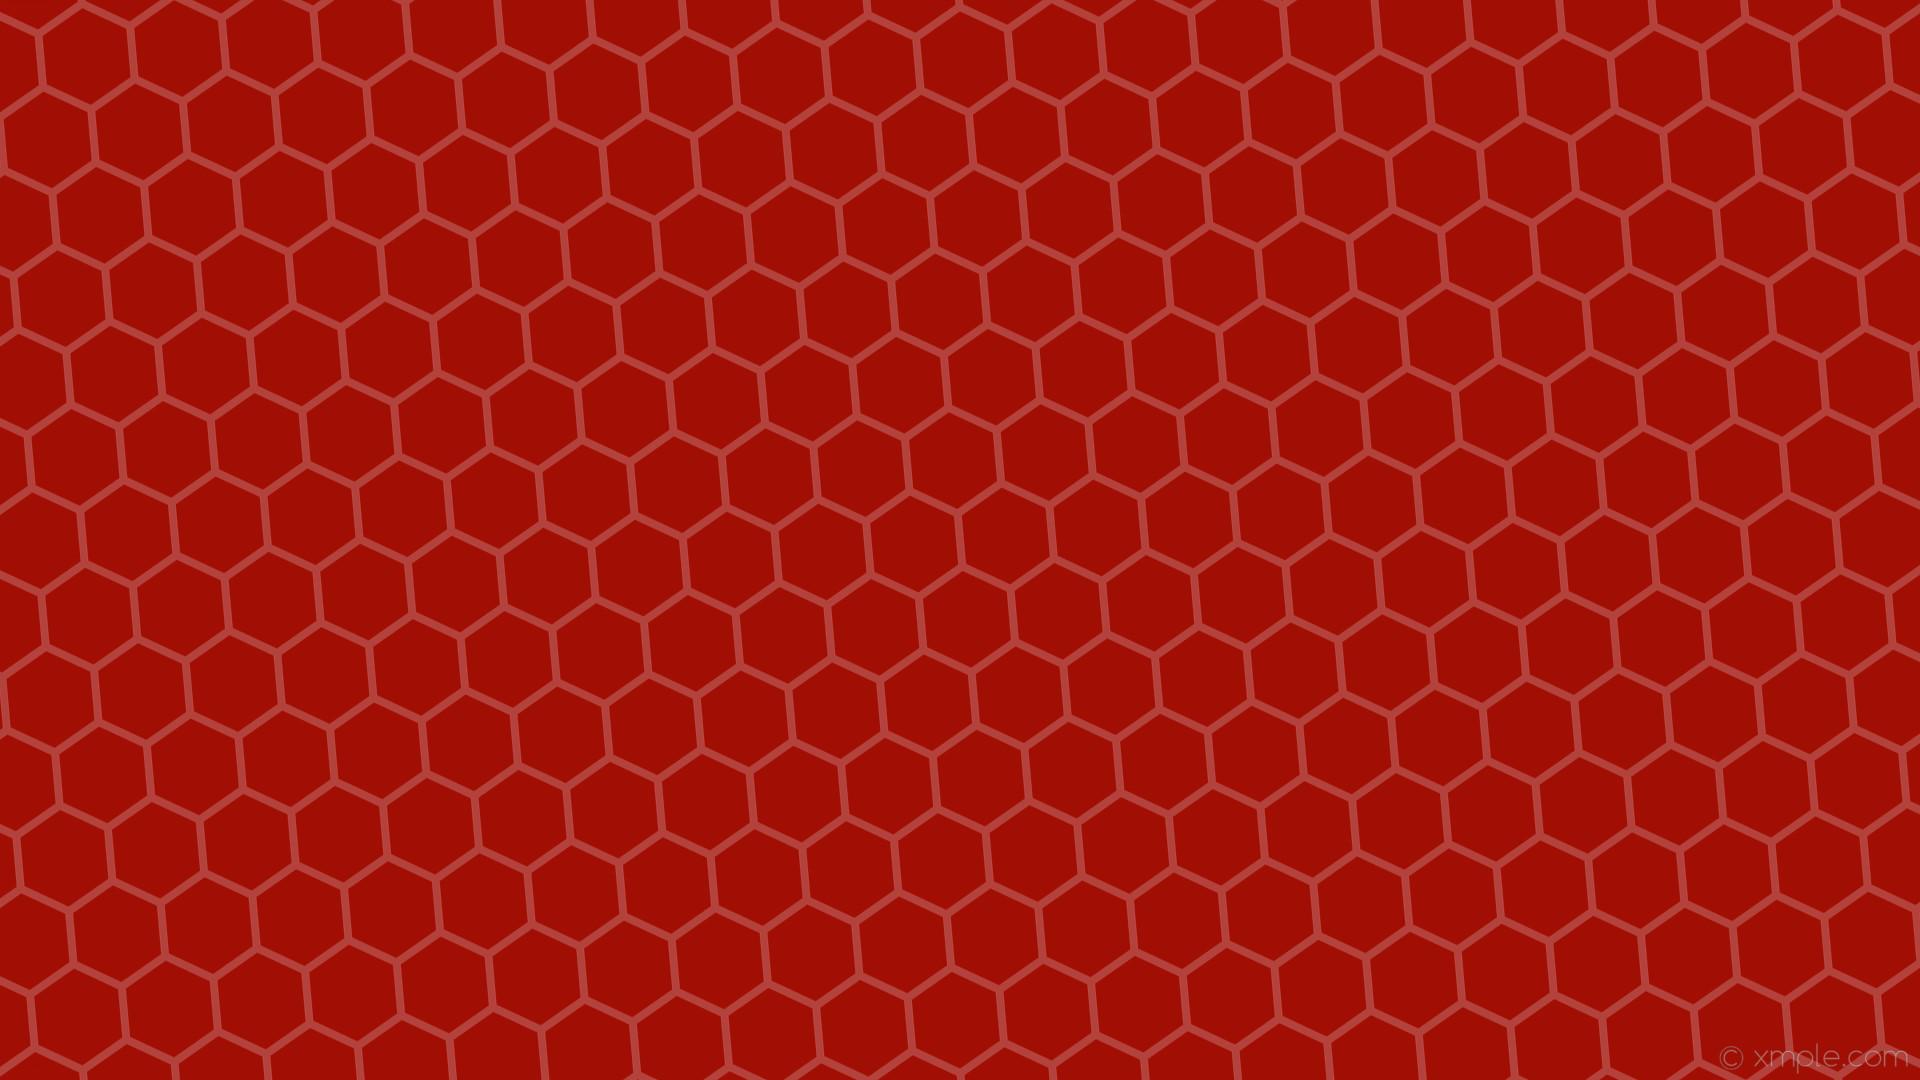 wallpaper red honeycomb hexagon beehive #a00e04 #b2423b diagonal 5° 8px 92px